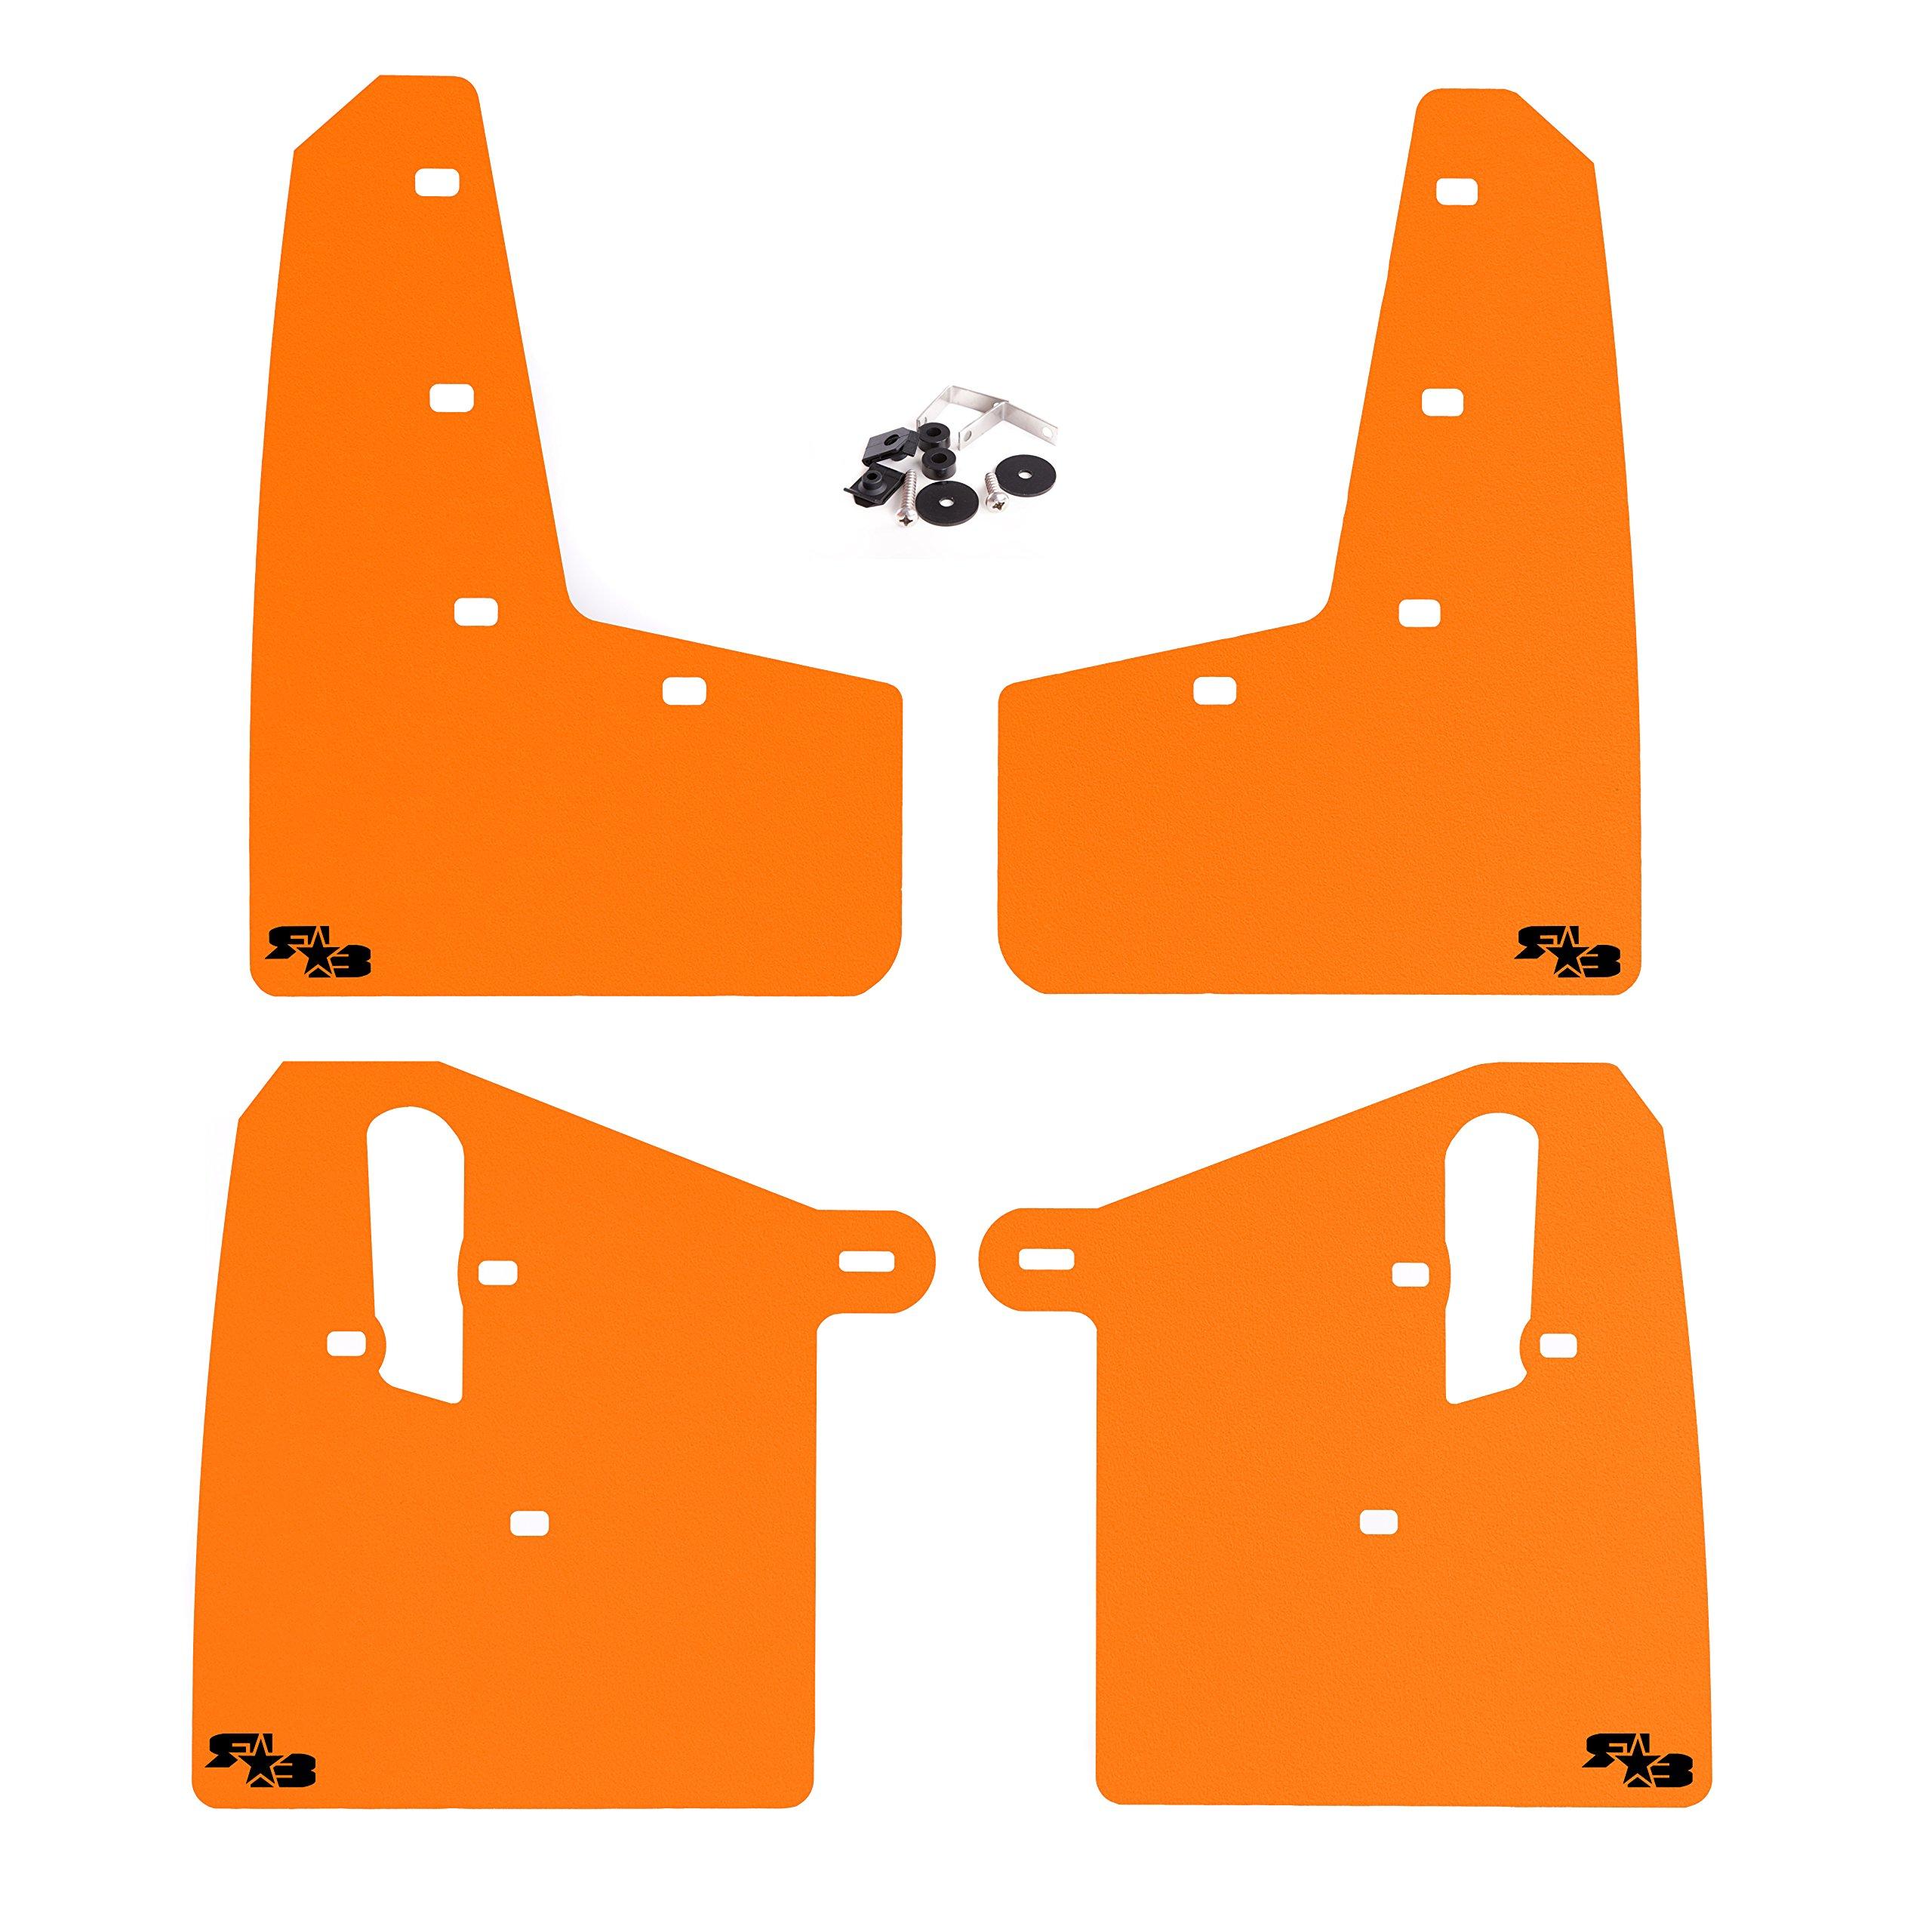 RokBlokz Mud Flaps for 2015+ Subaru WRX STI - Multiple Colors Available - Includes All Mounting Hardware (Orange with Black Logo, Short)